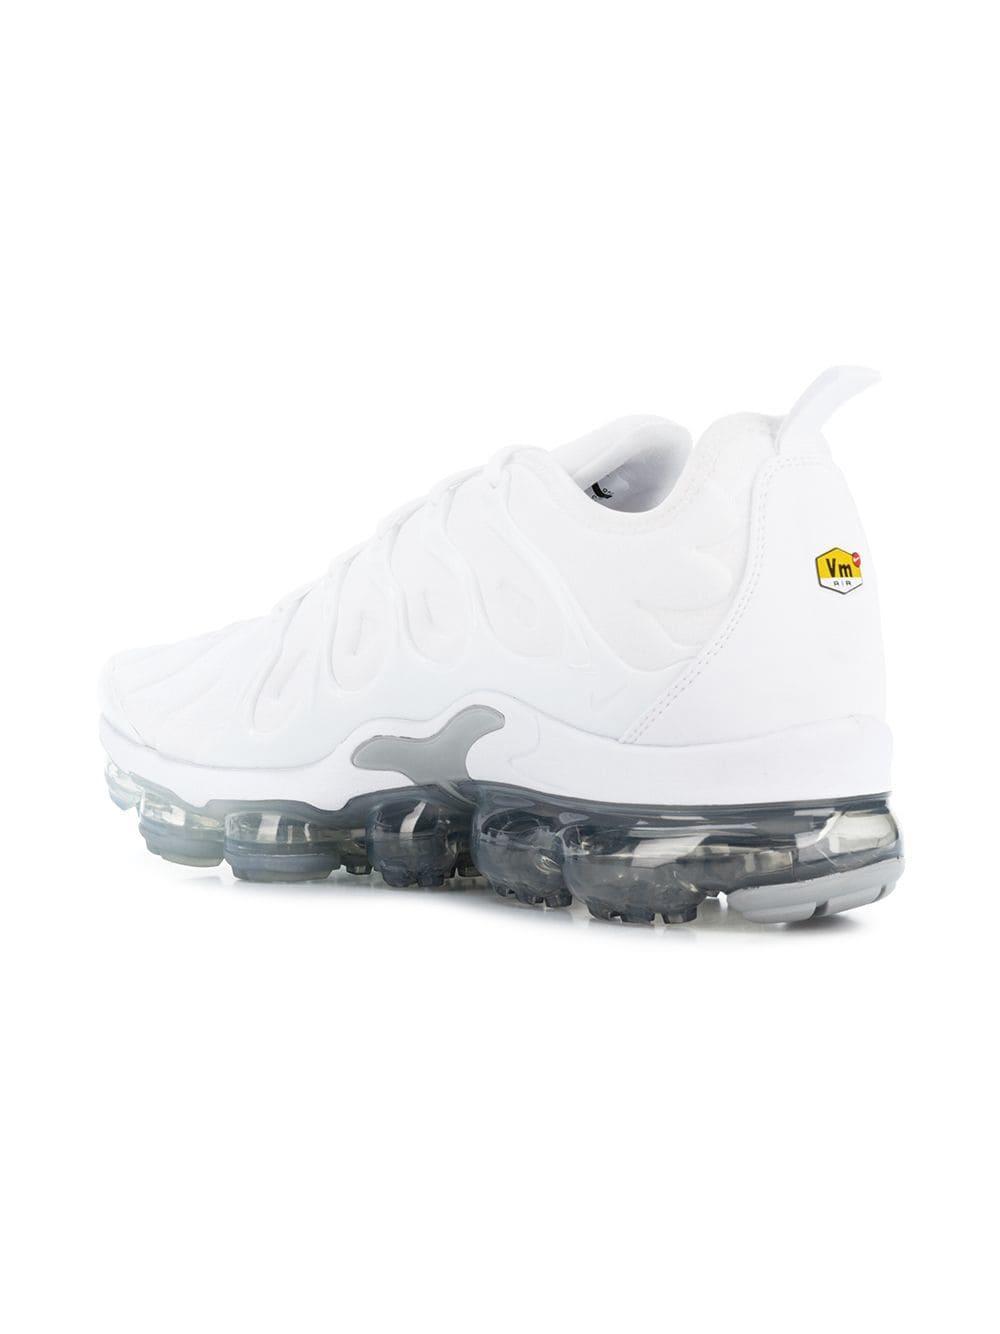 65c8de18720c8 Nike - White Baskets Air Vapormax Plus Sneakers for Men - Lyst. View  fullscreen